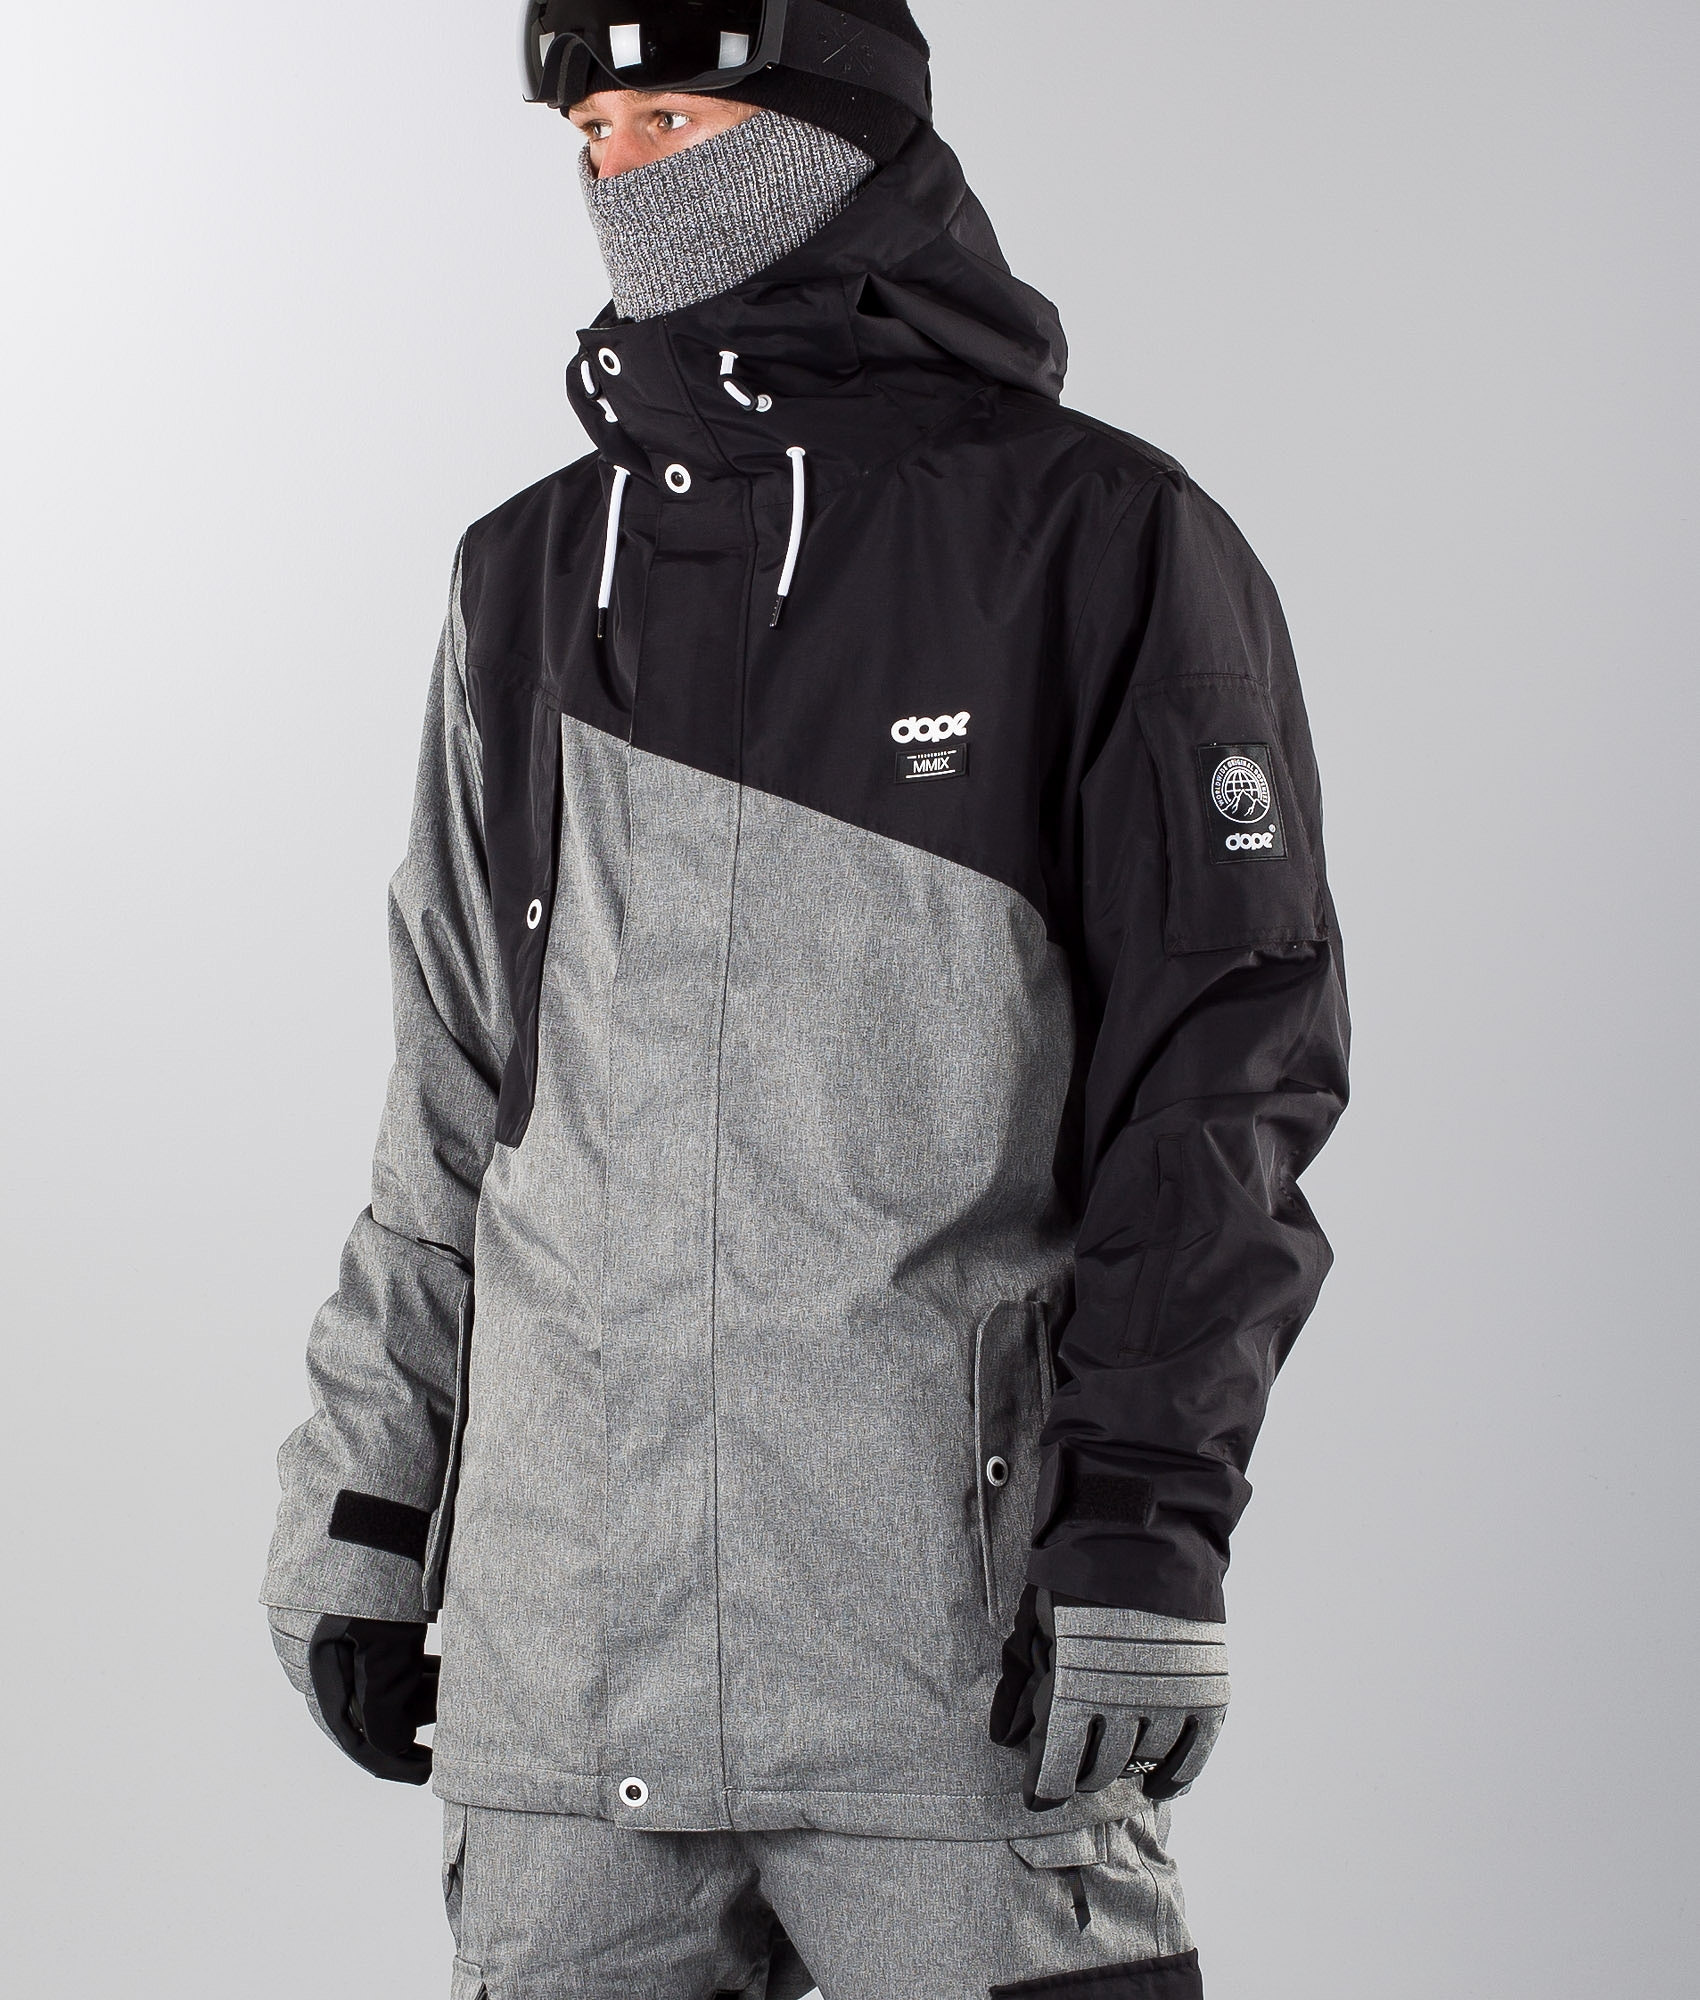 98cb2fbc5 Men's Snowboard Jackets | Fast & Free Delivery | RIDESTORE